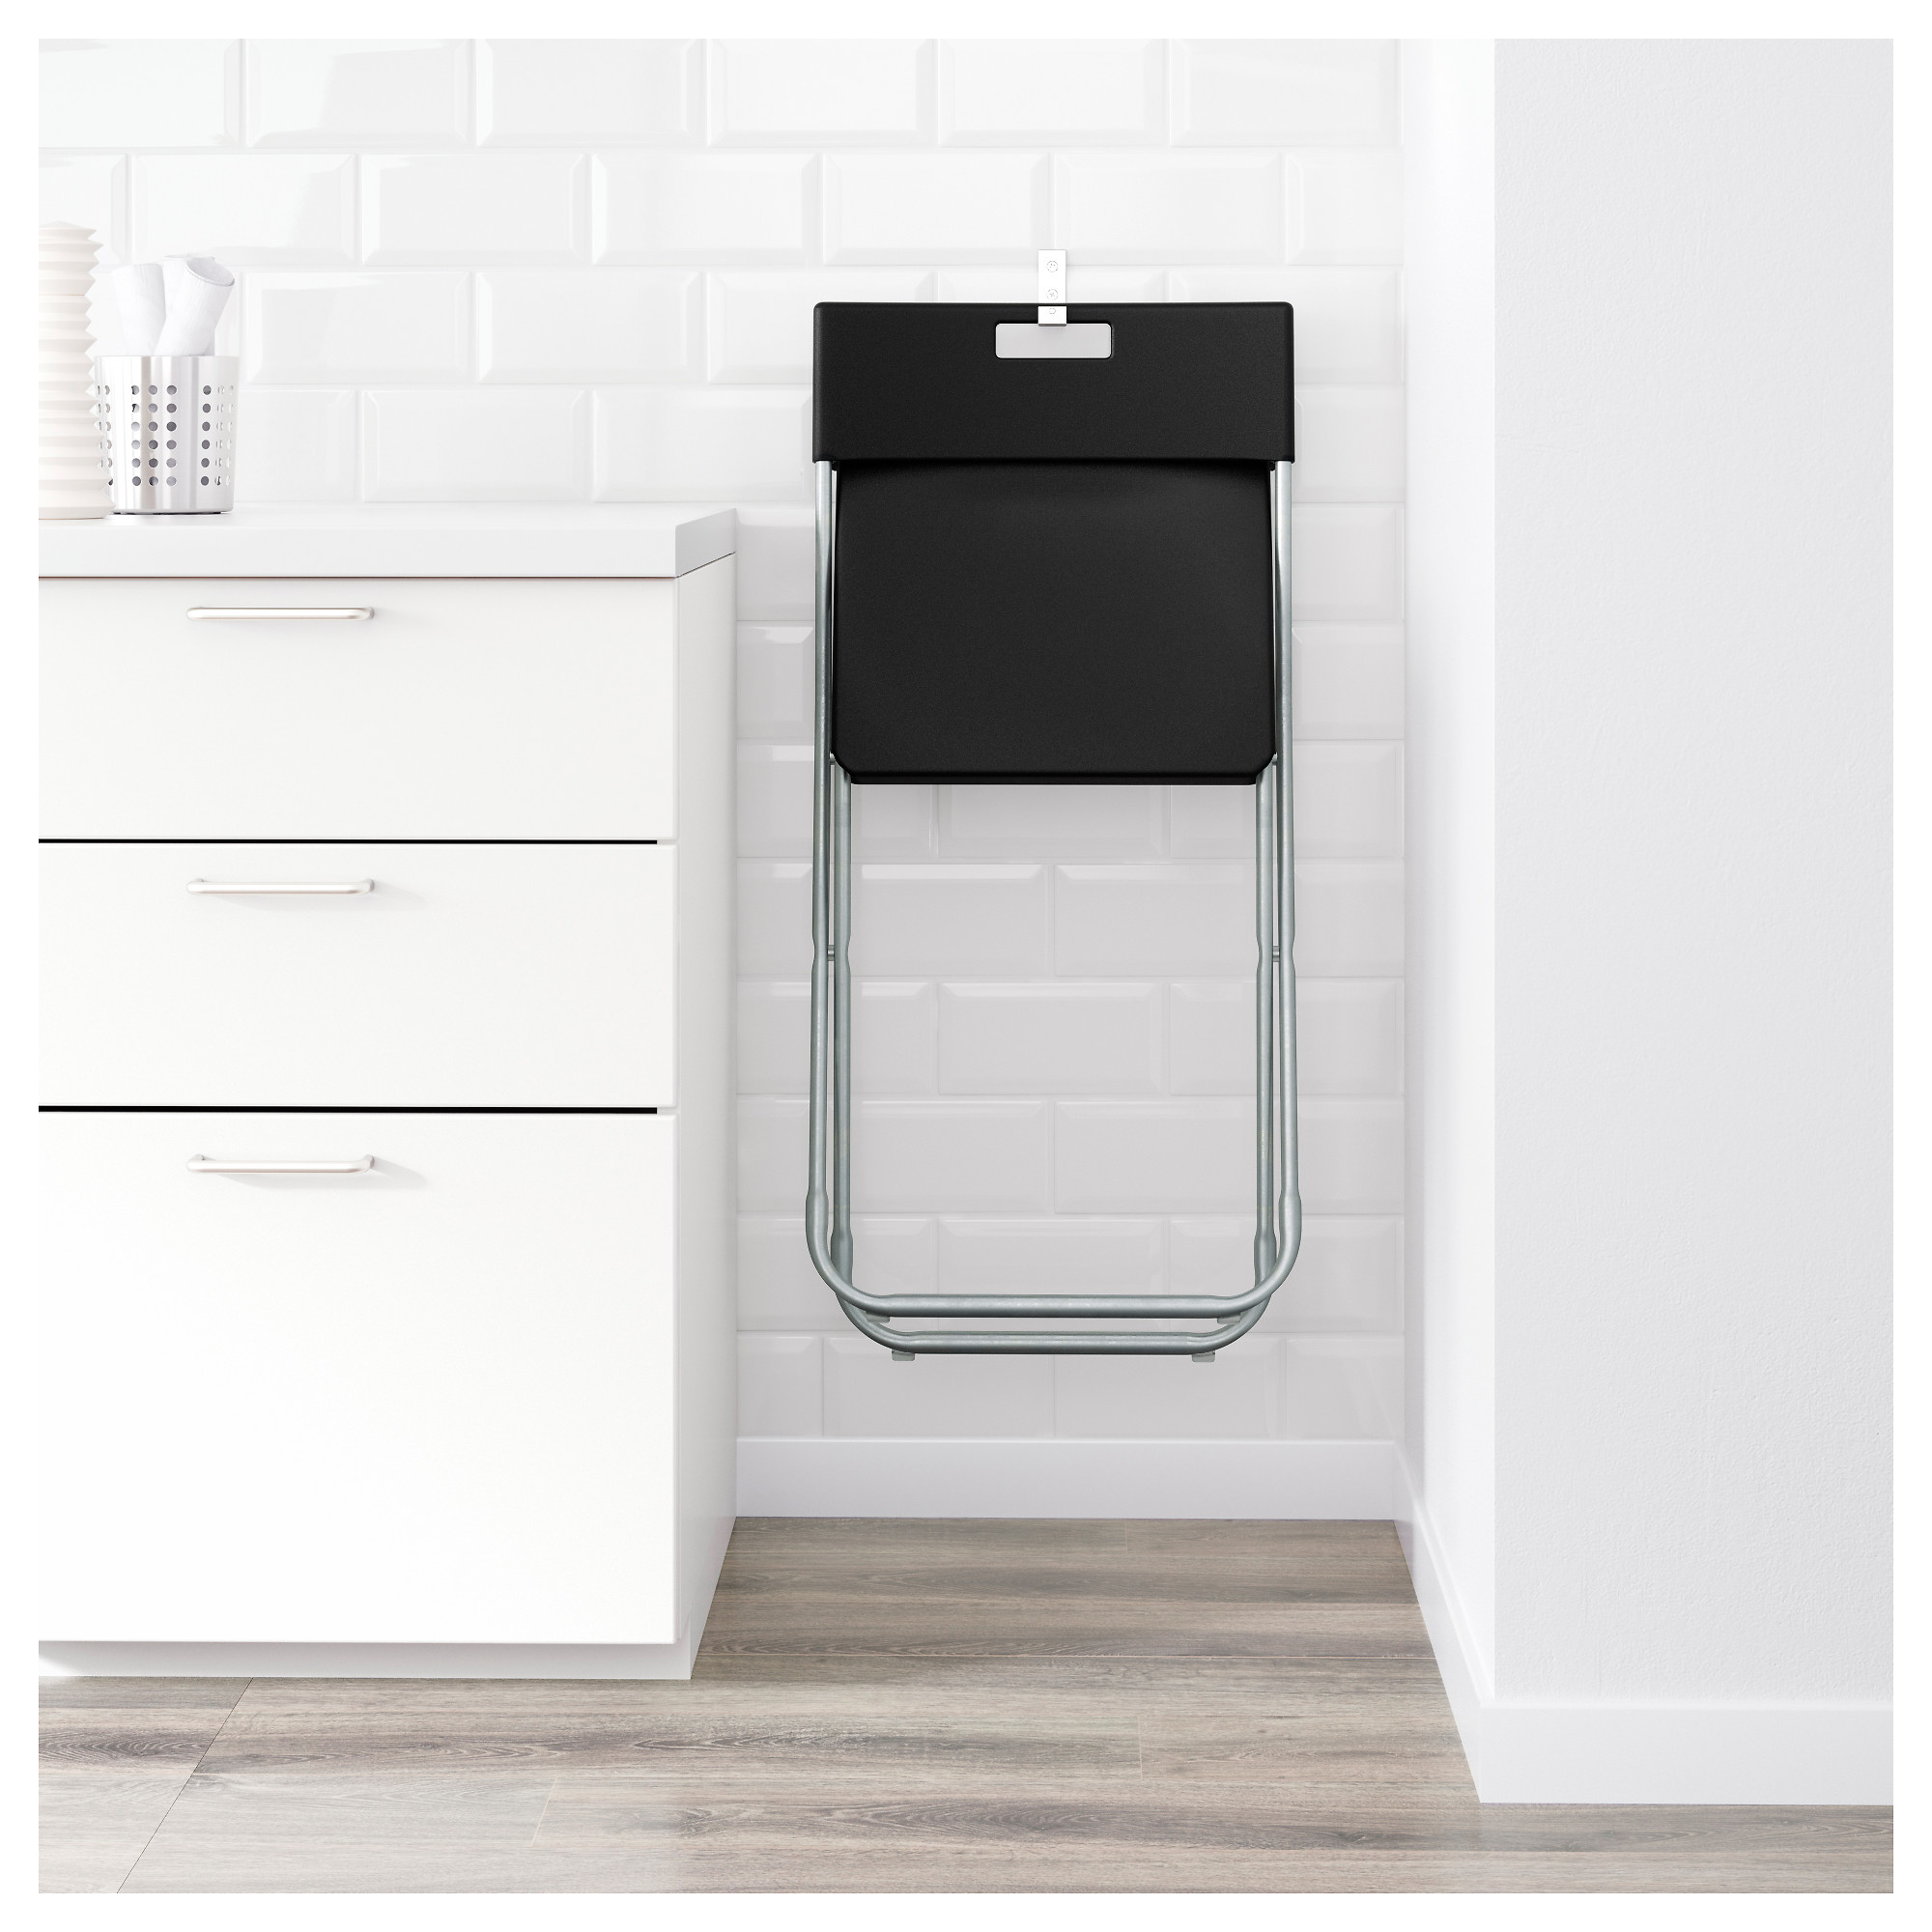 IKEA Lithuania - Shop for Furniture, Lighting, Home